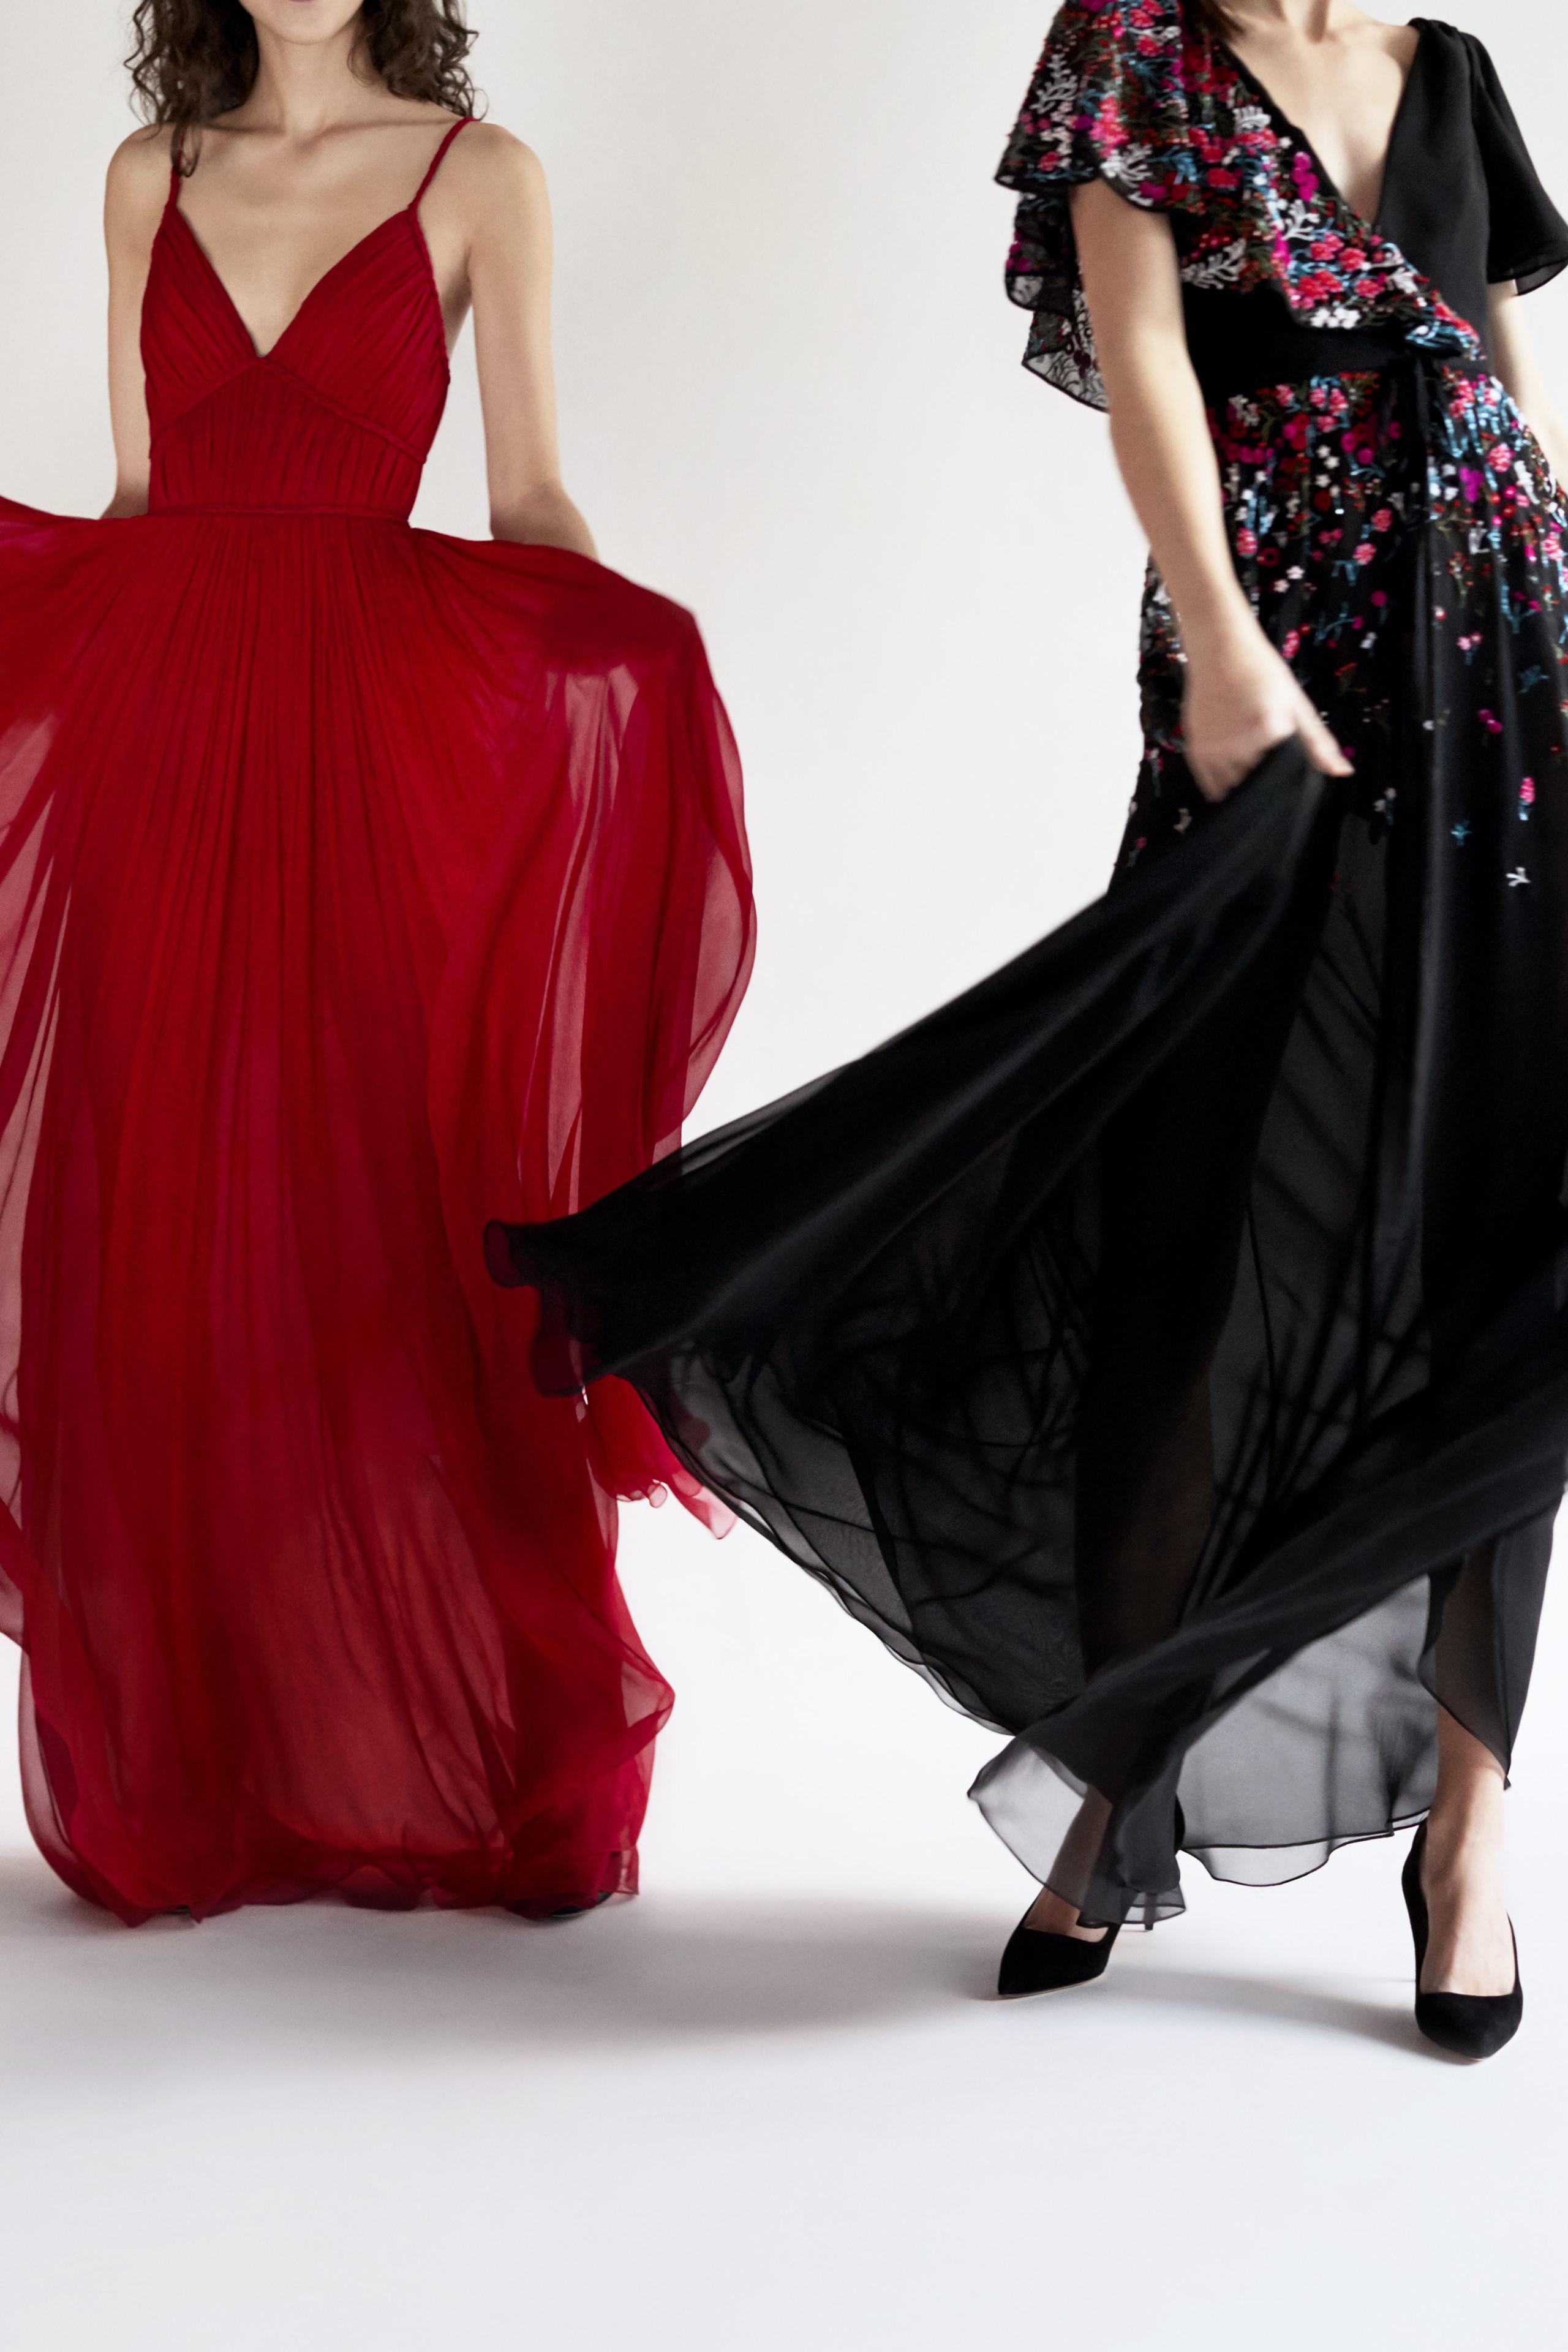 Foto de Carolina Herrera NY Pre Fall 2018: una maravillosa colección de Alta Costura (32/33)